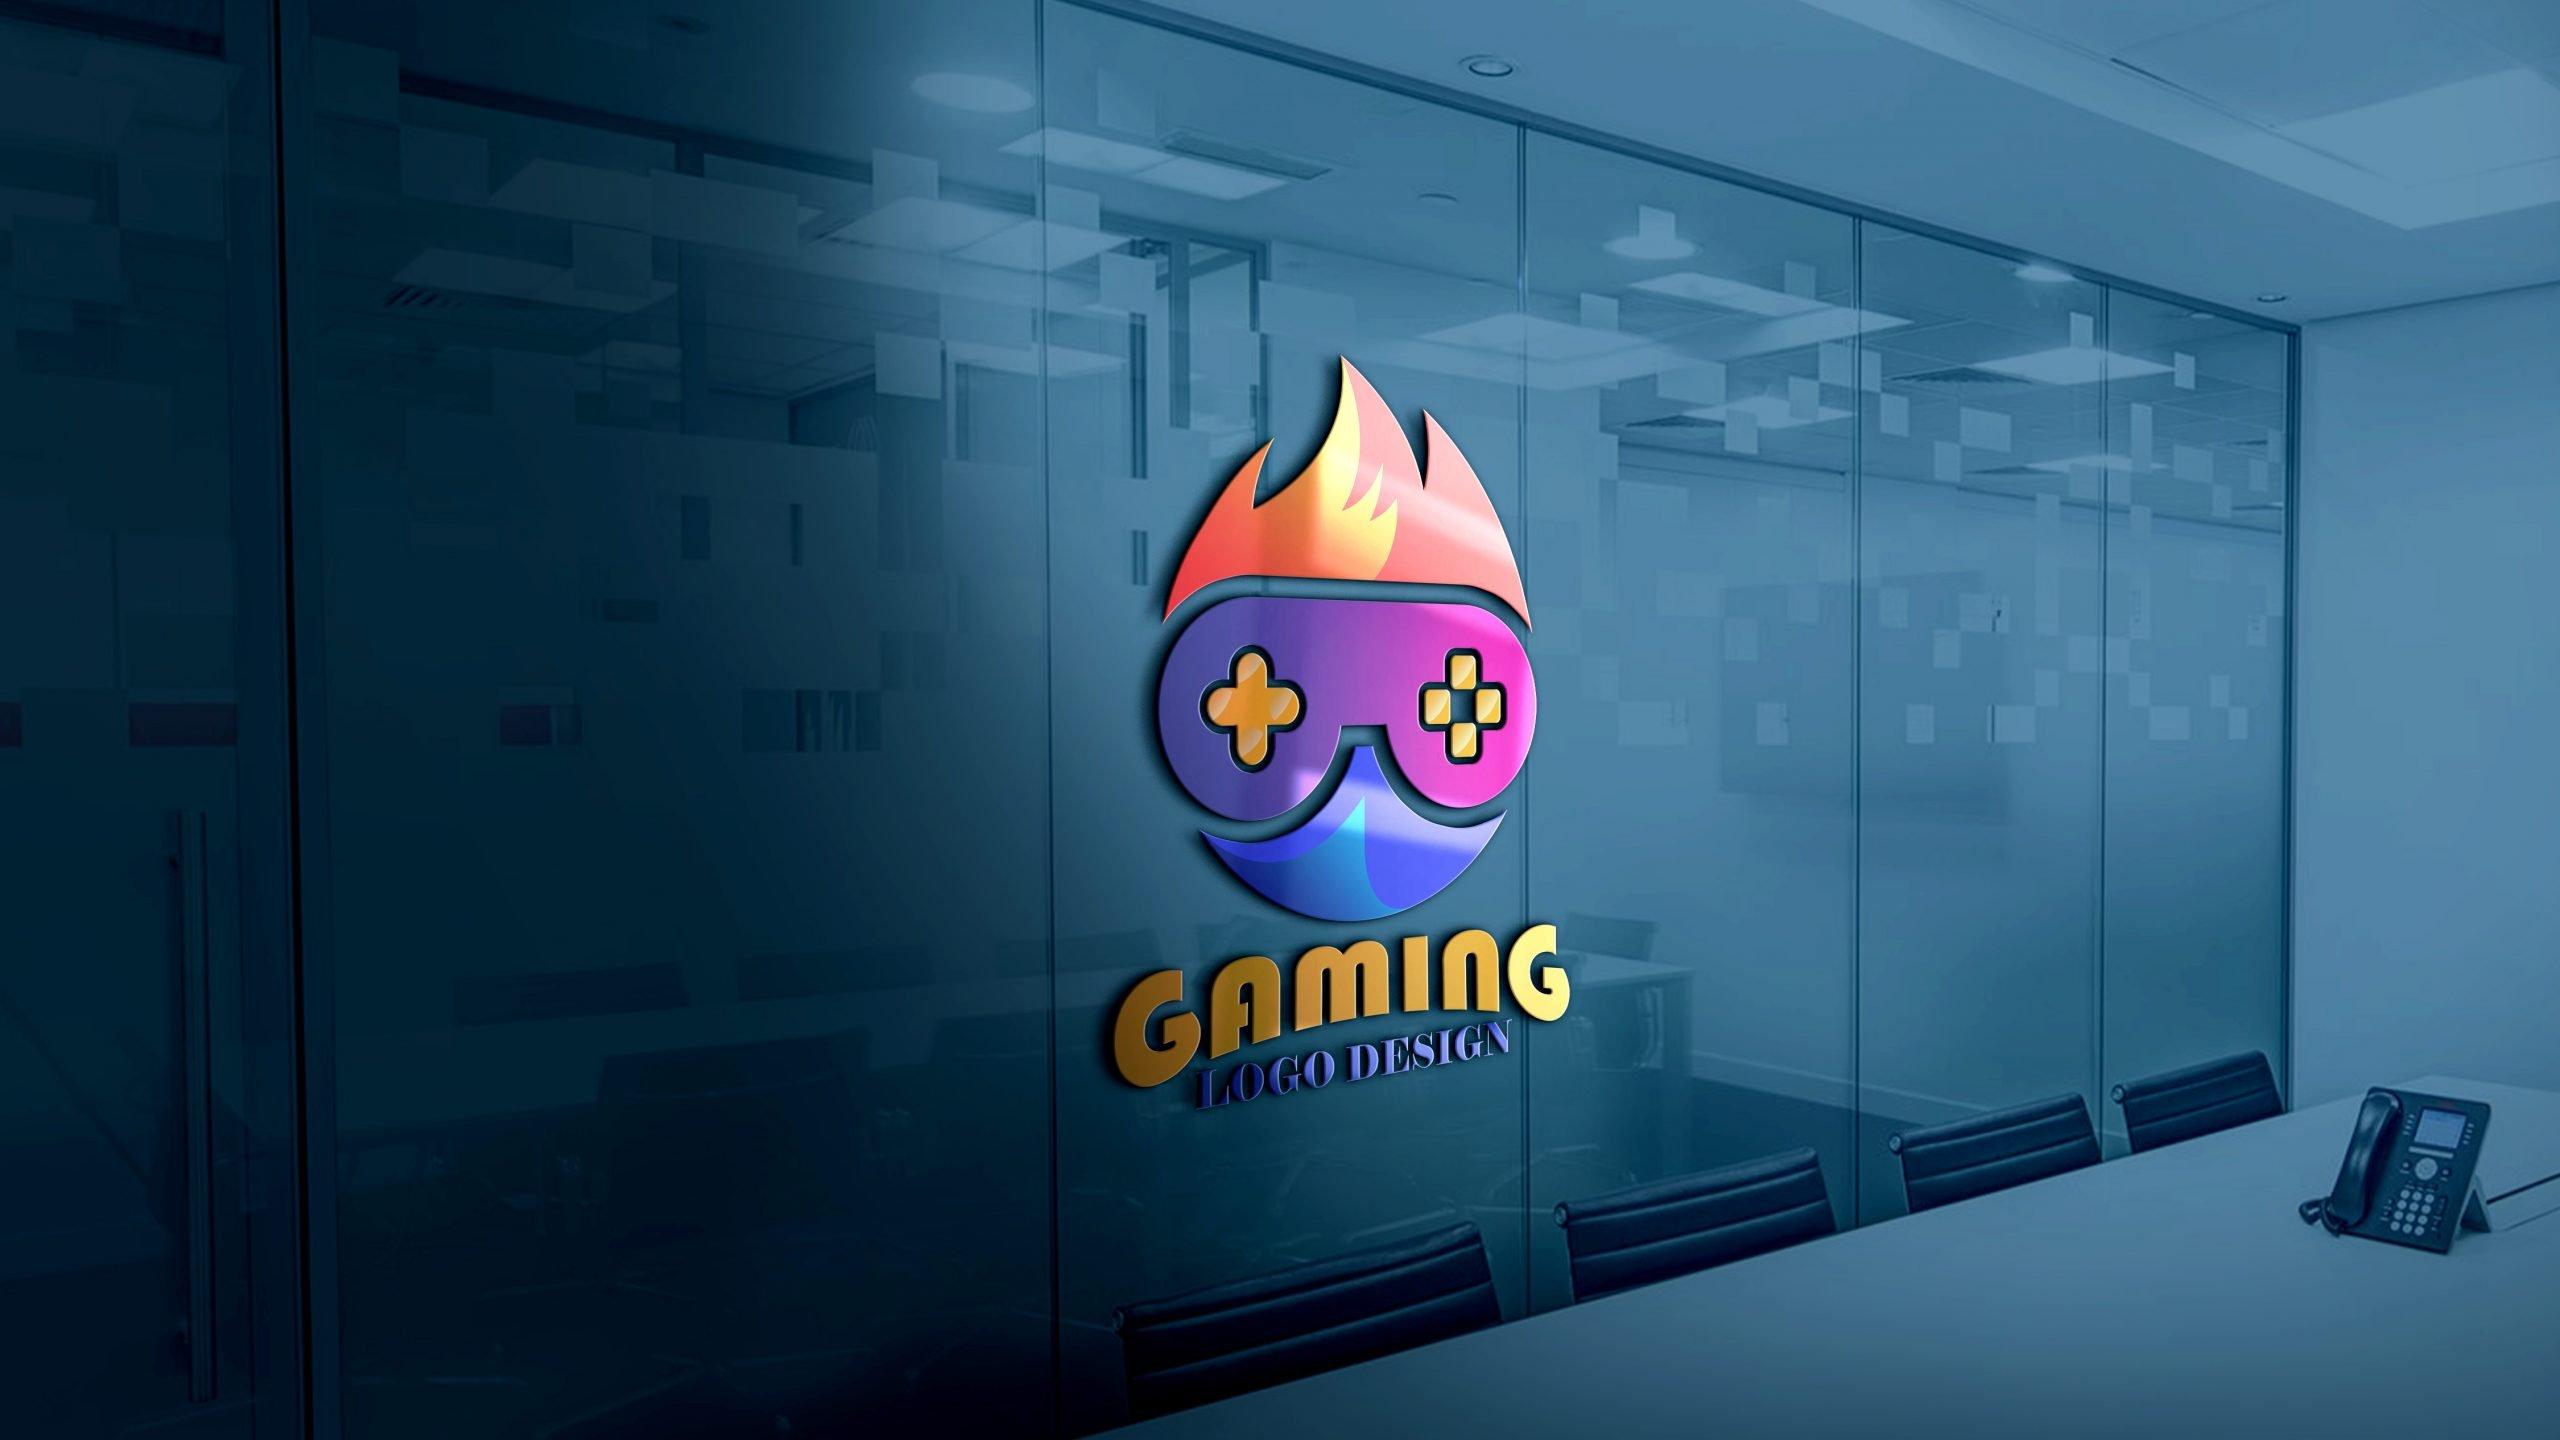 Free Download Gaming Logo Design Vector